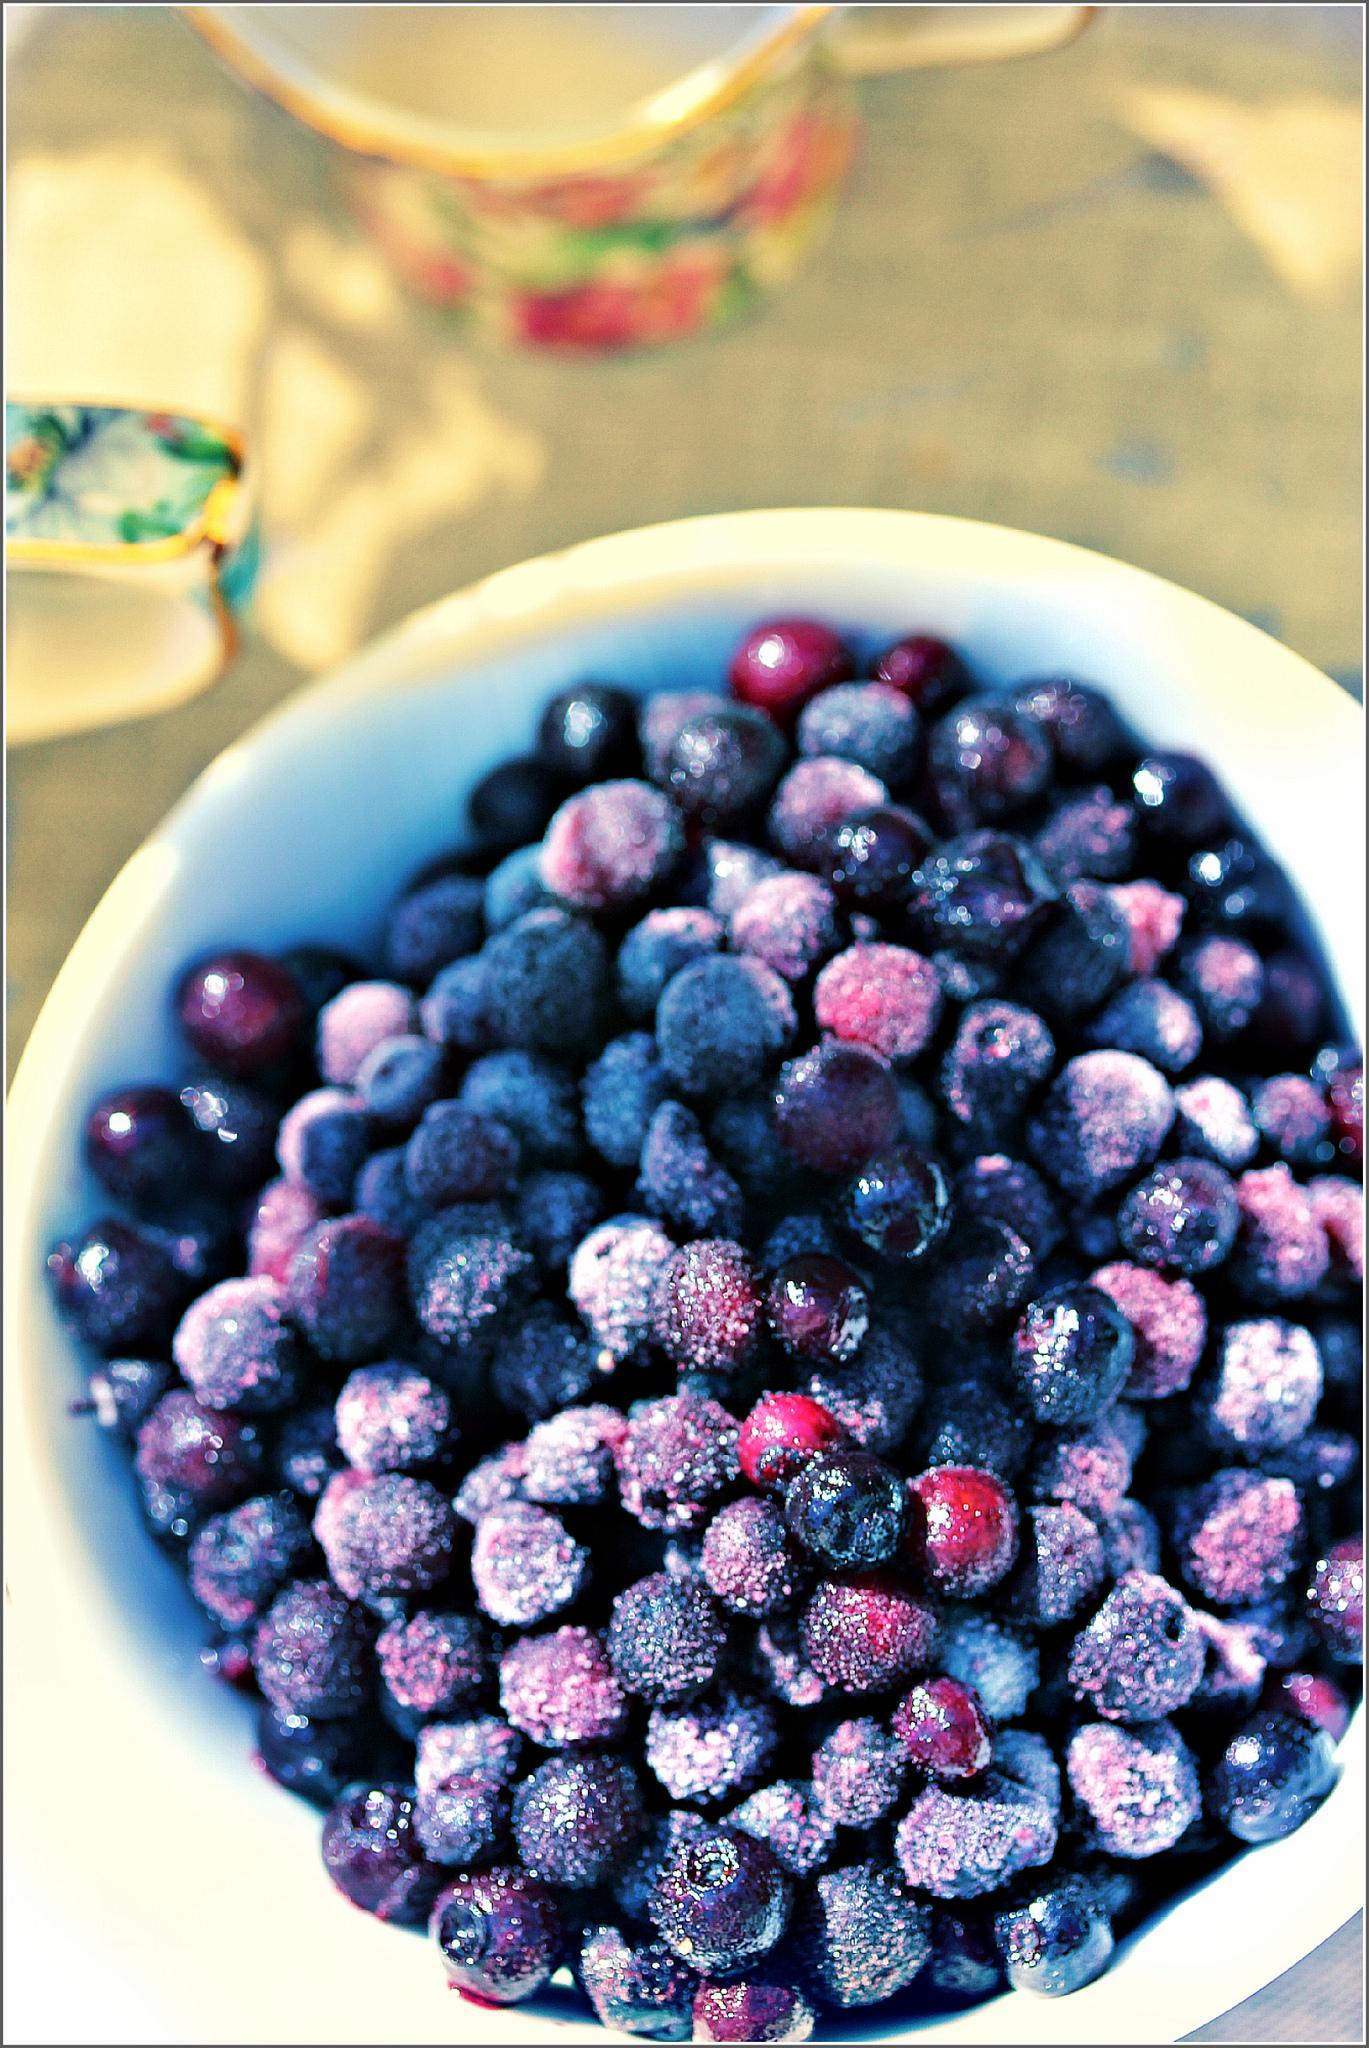 ©Blueberries by Dena T Bray